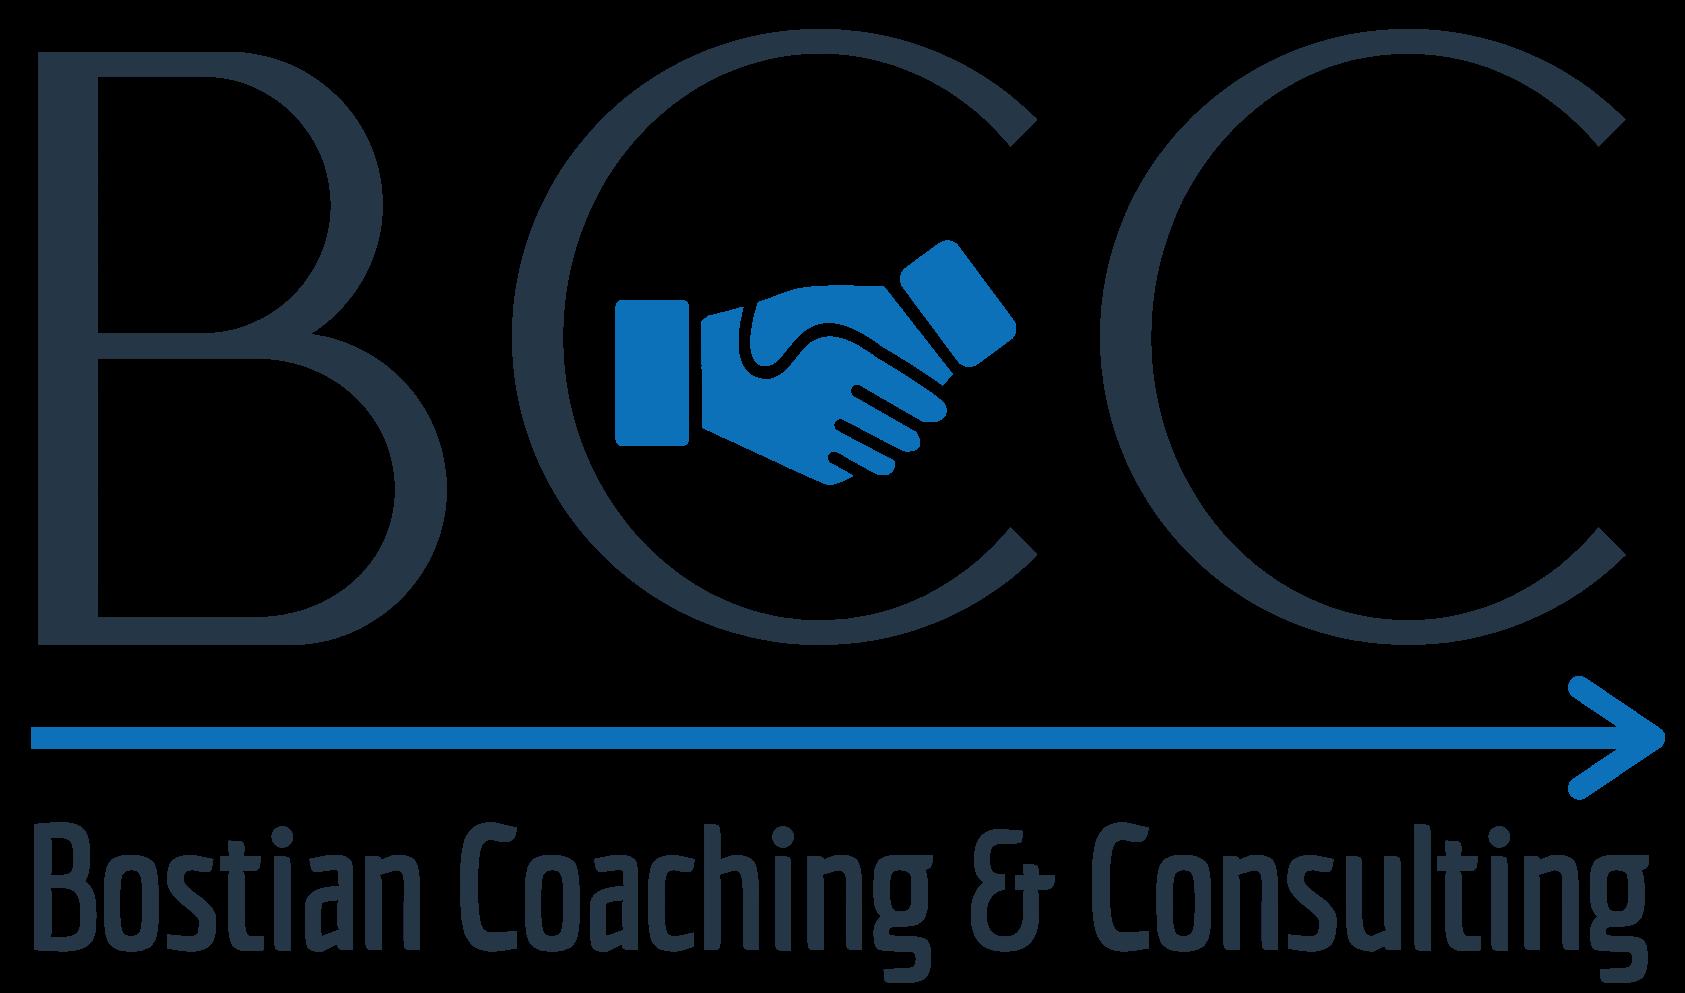 Bostian Coaching & Consulting